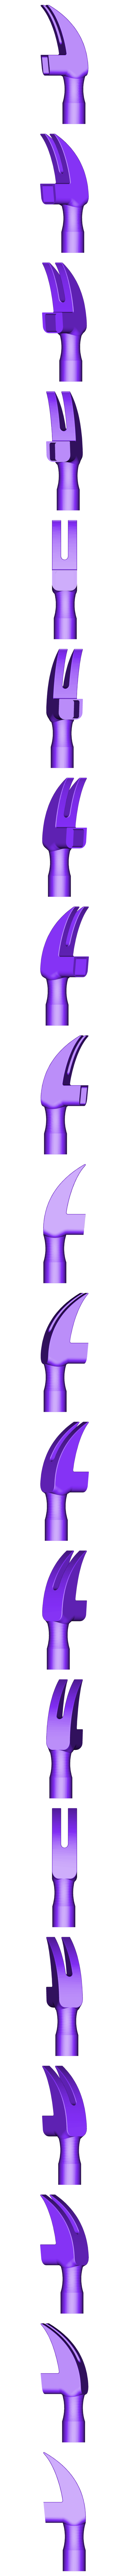 Hammer_Head.STL Download free STL file Hammer • 3D printing model, alterboy987